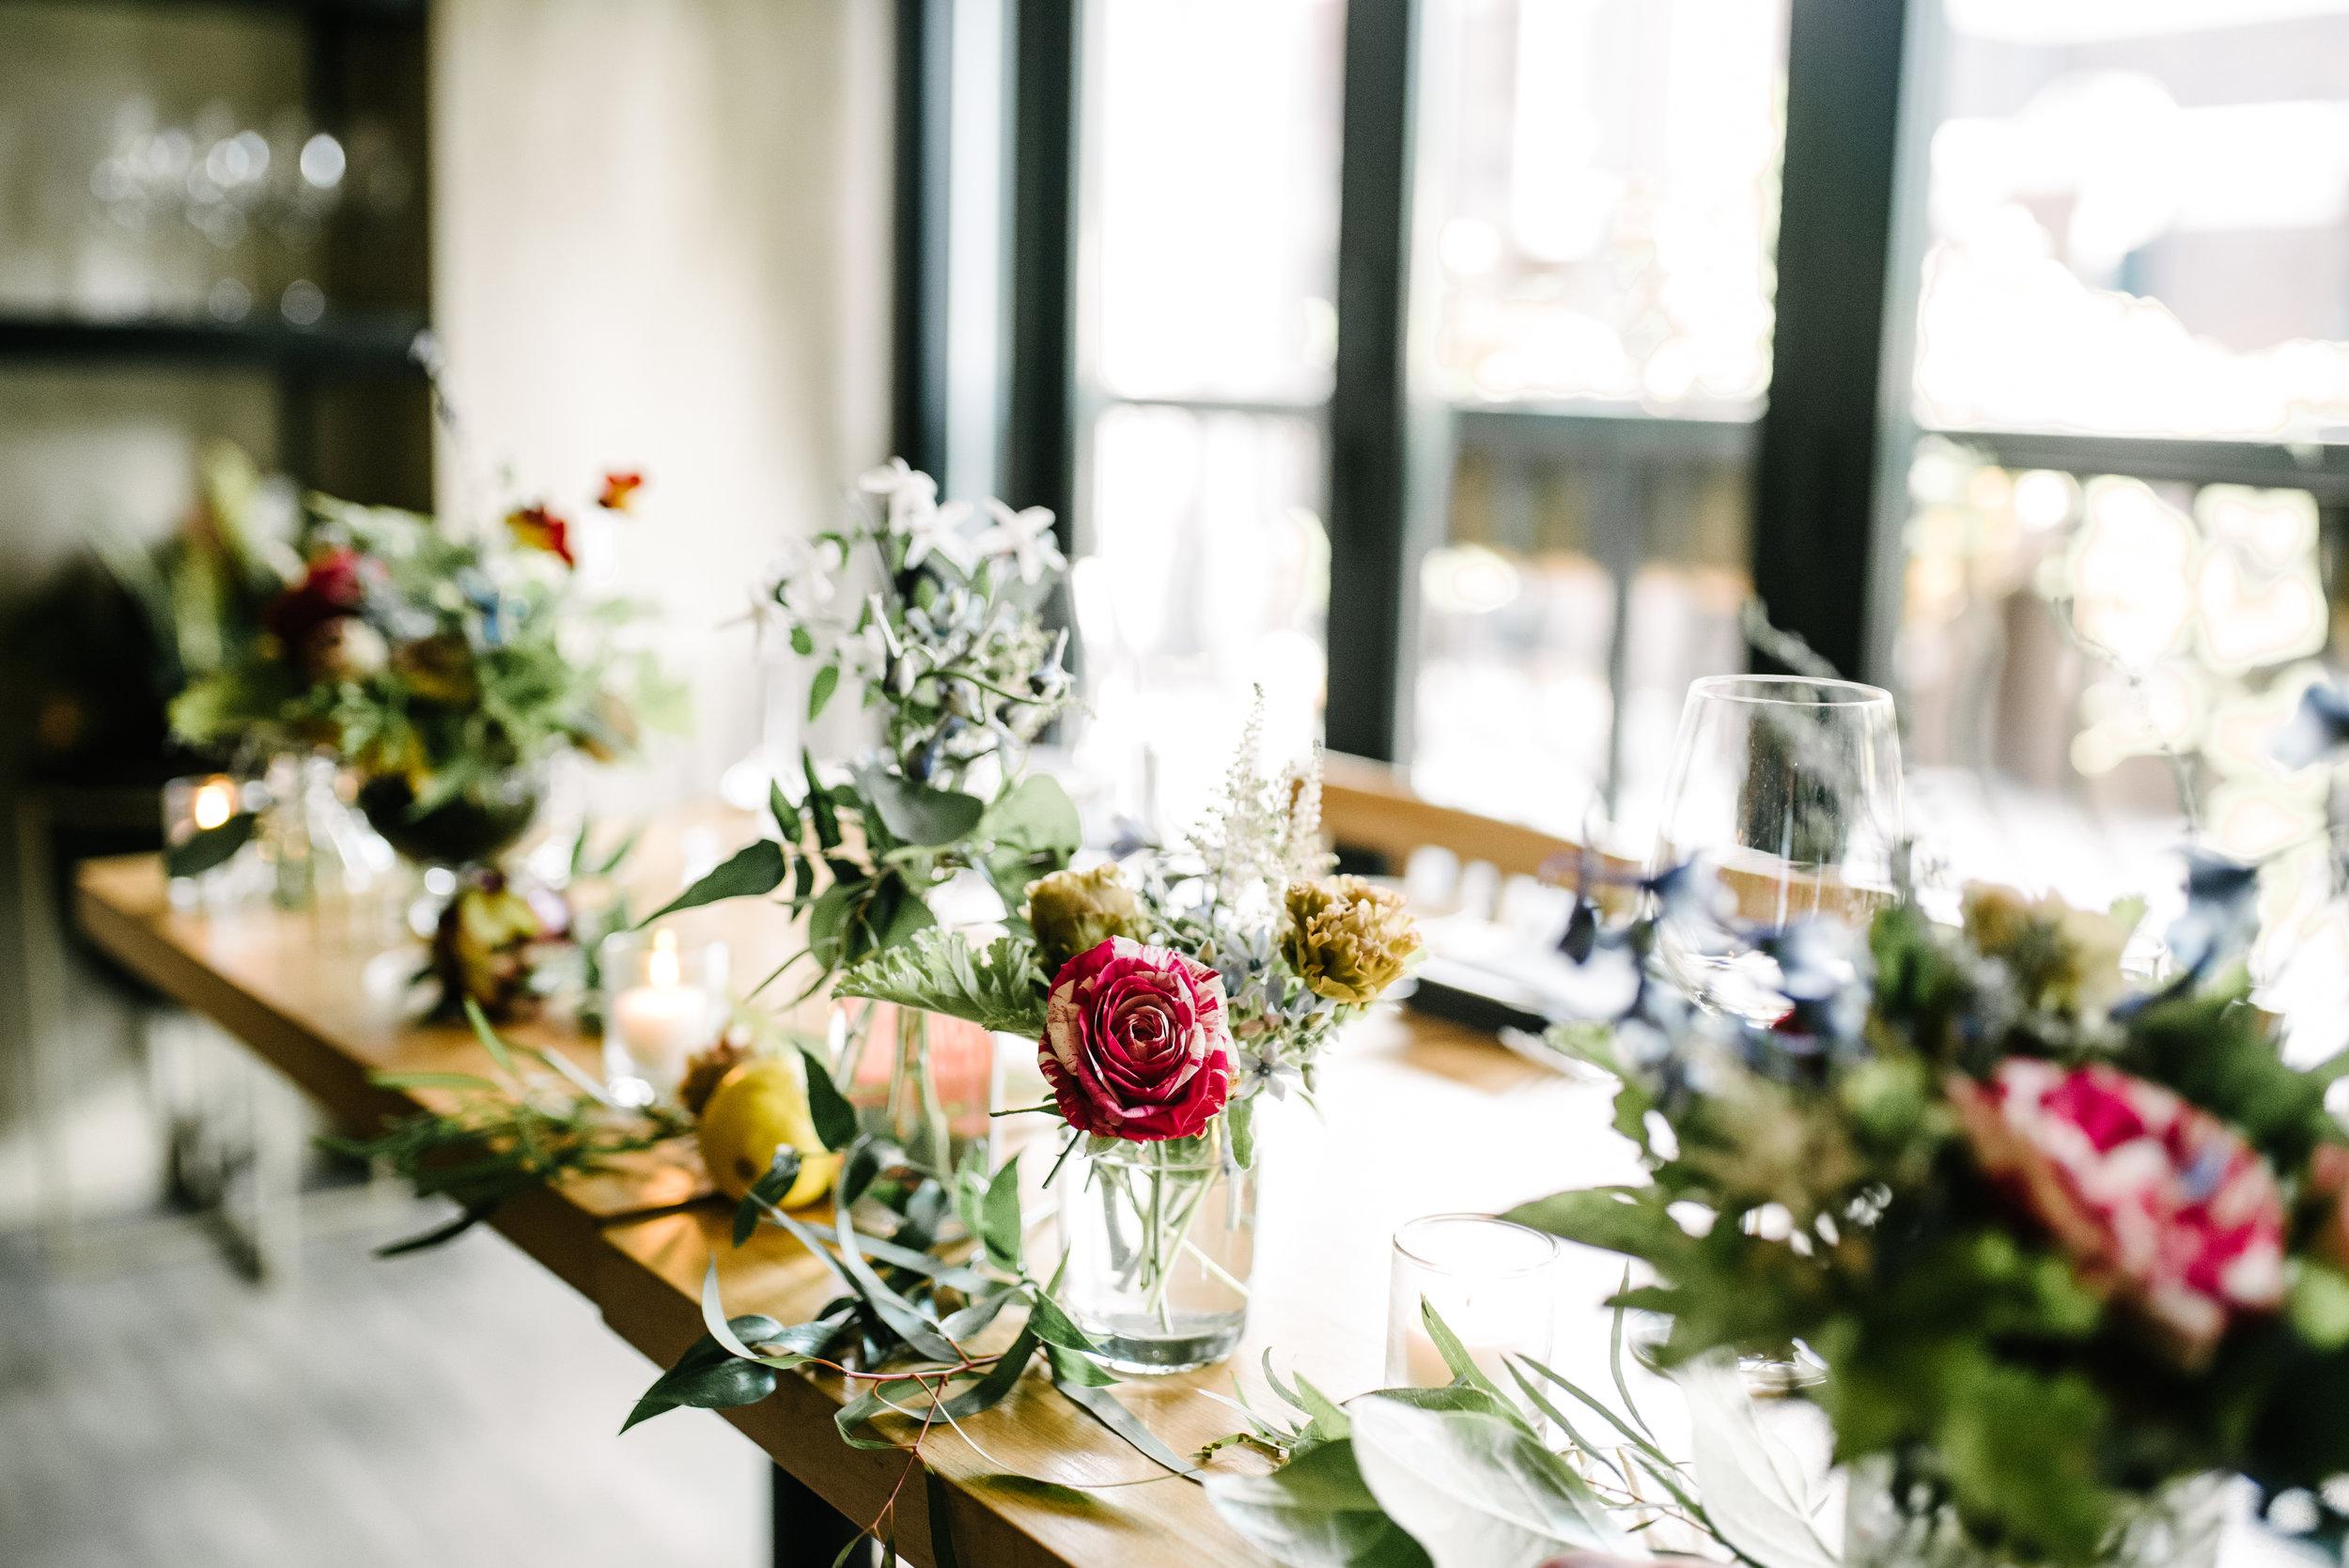 agpcollective_wedding_vernick-4952.jpg